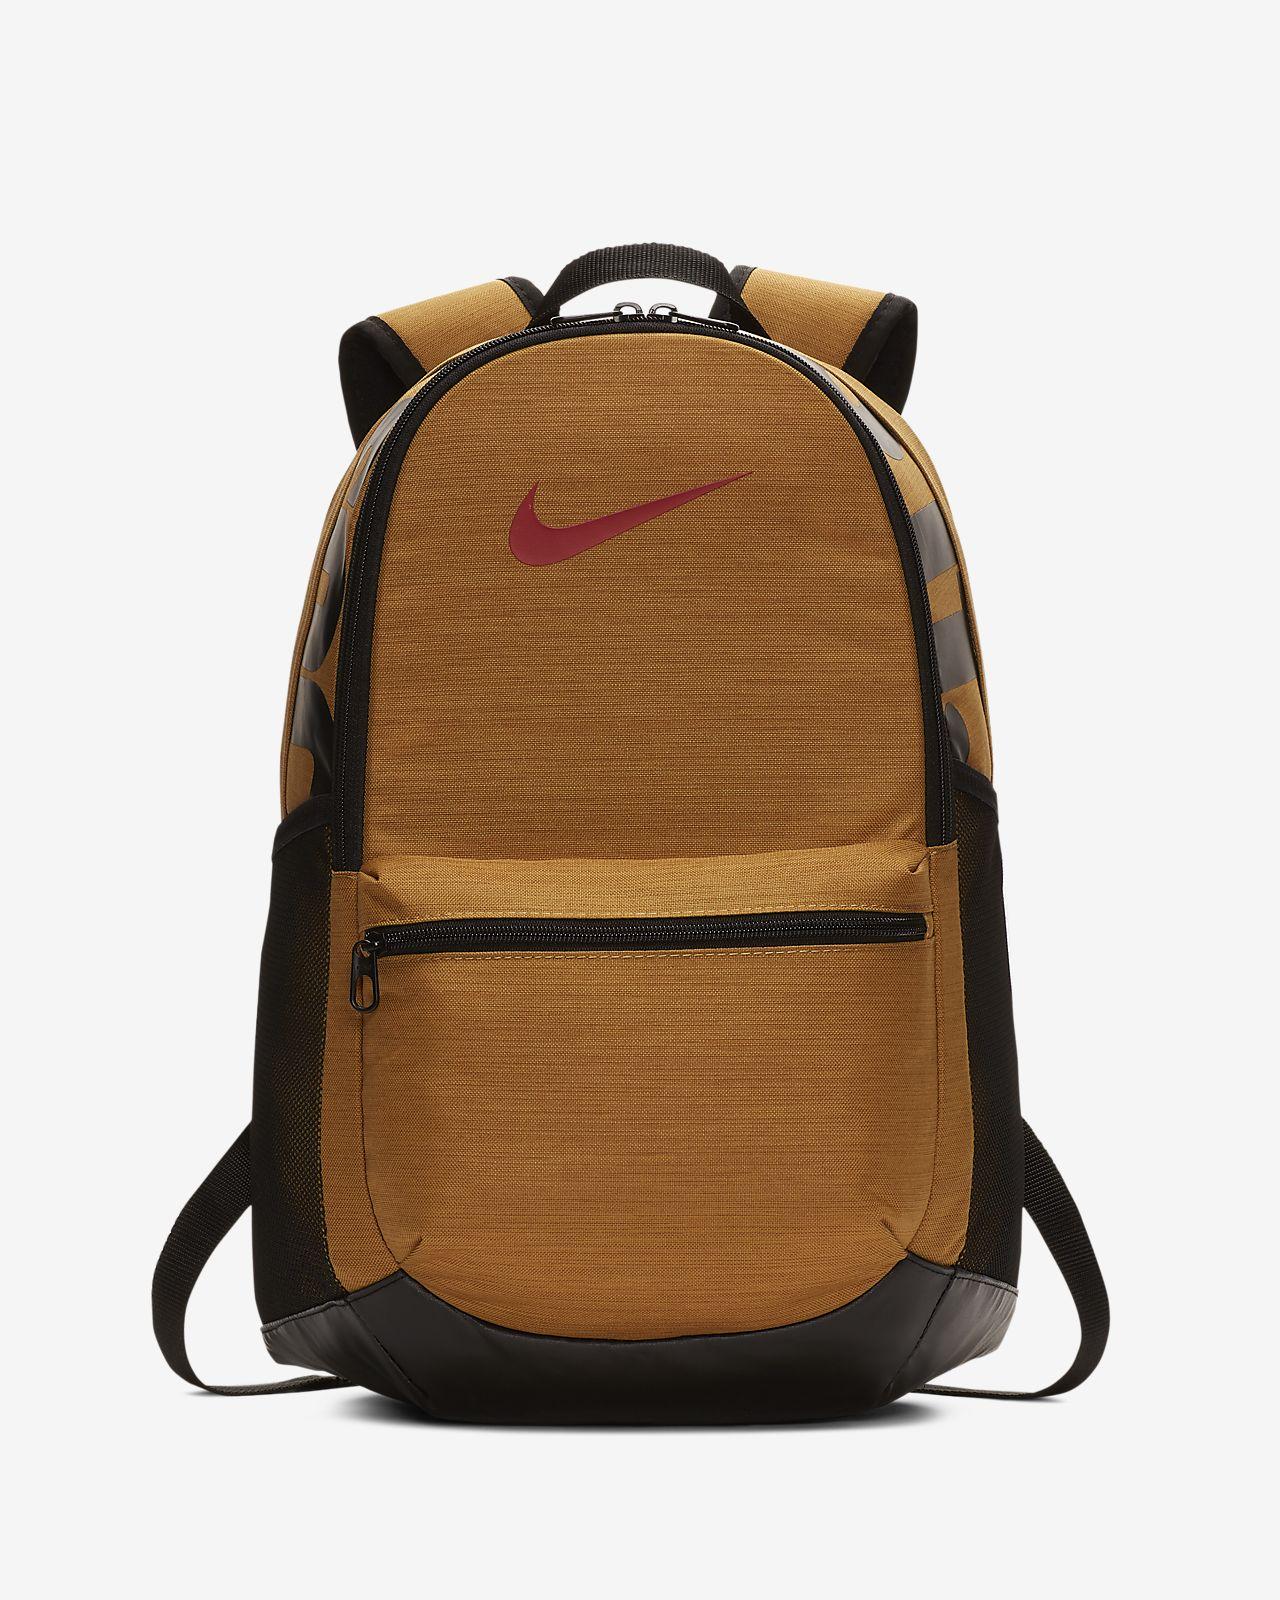 c8964166d03 Nike Brasilia (Medium) Training Backpack. Nike.com